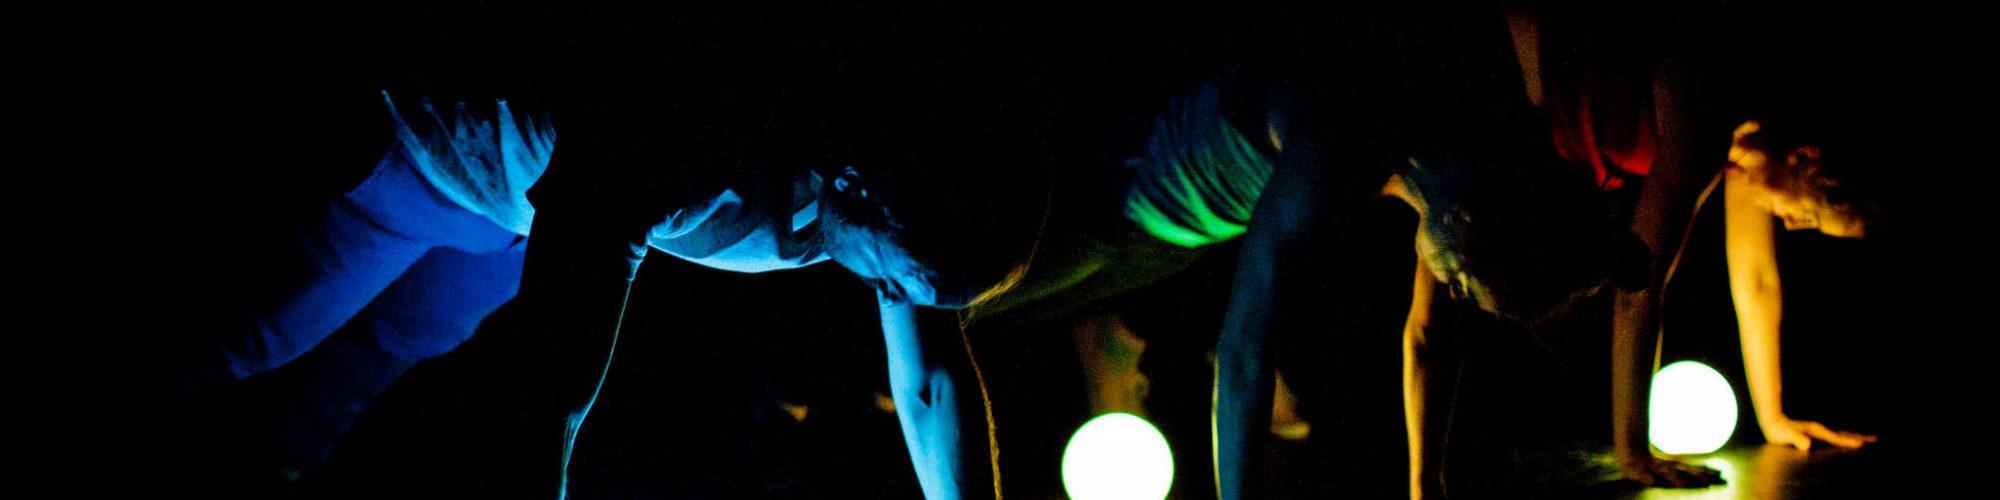 Crédit : Valérie Sangin. Gigue in the dark 1.0 de Lük Fleury, Sandrine Martel-Laferrière, Ian Yaworski; avec Sébastien Chalumeau, Sandrine Martel-Laferrière, Marie-Ève Tremblay